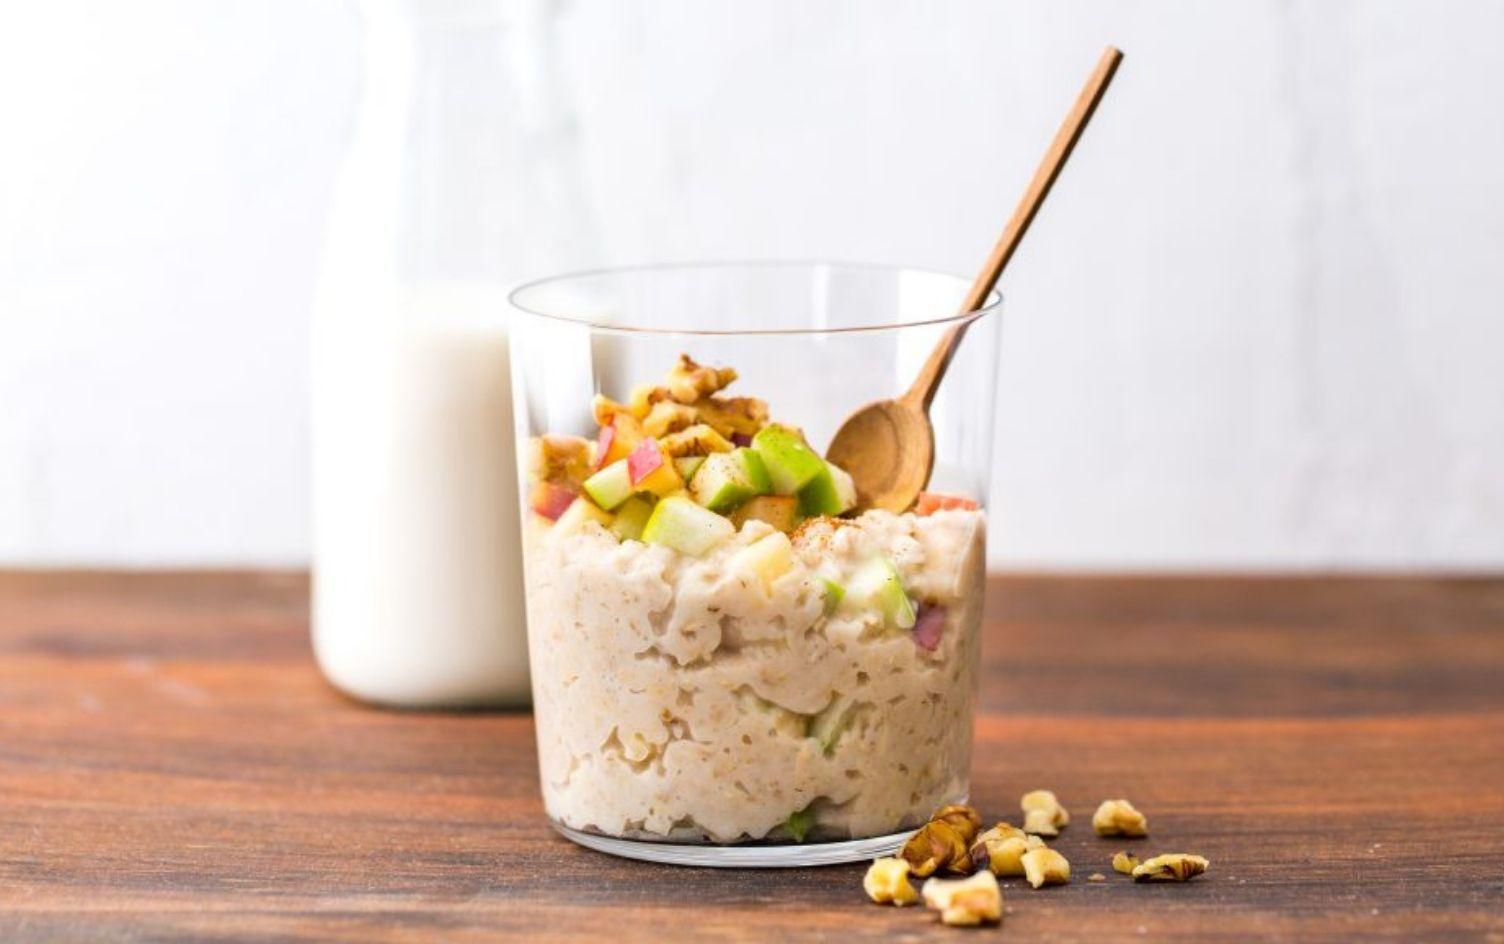 11 HighFiber Breakfast Recipes Under 420 Calories